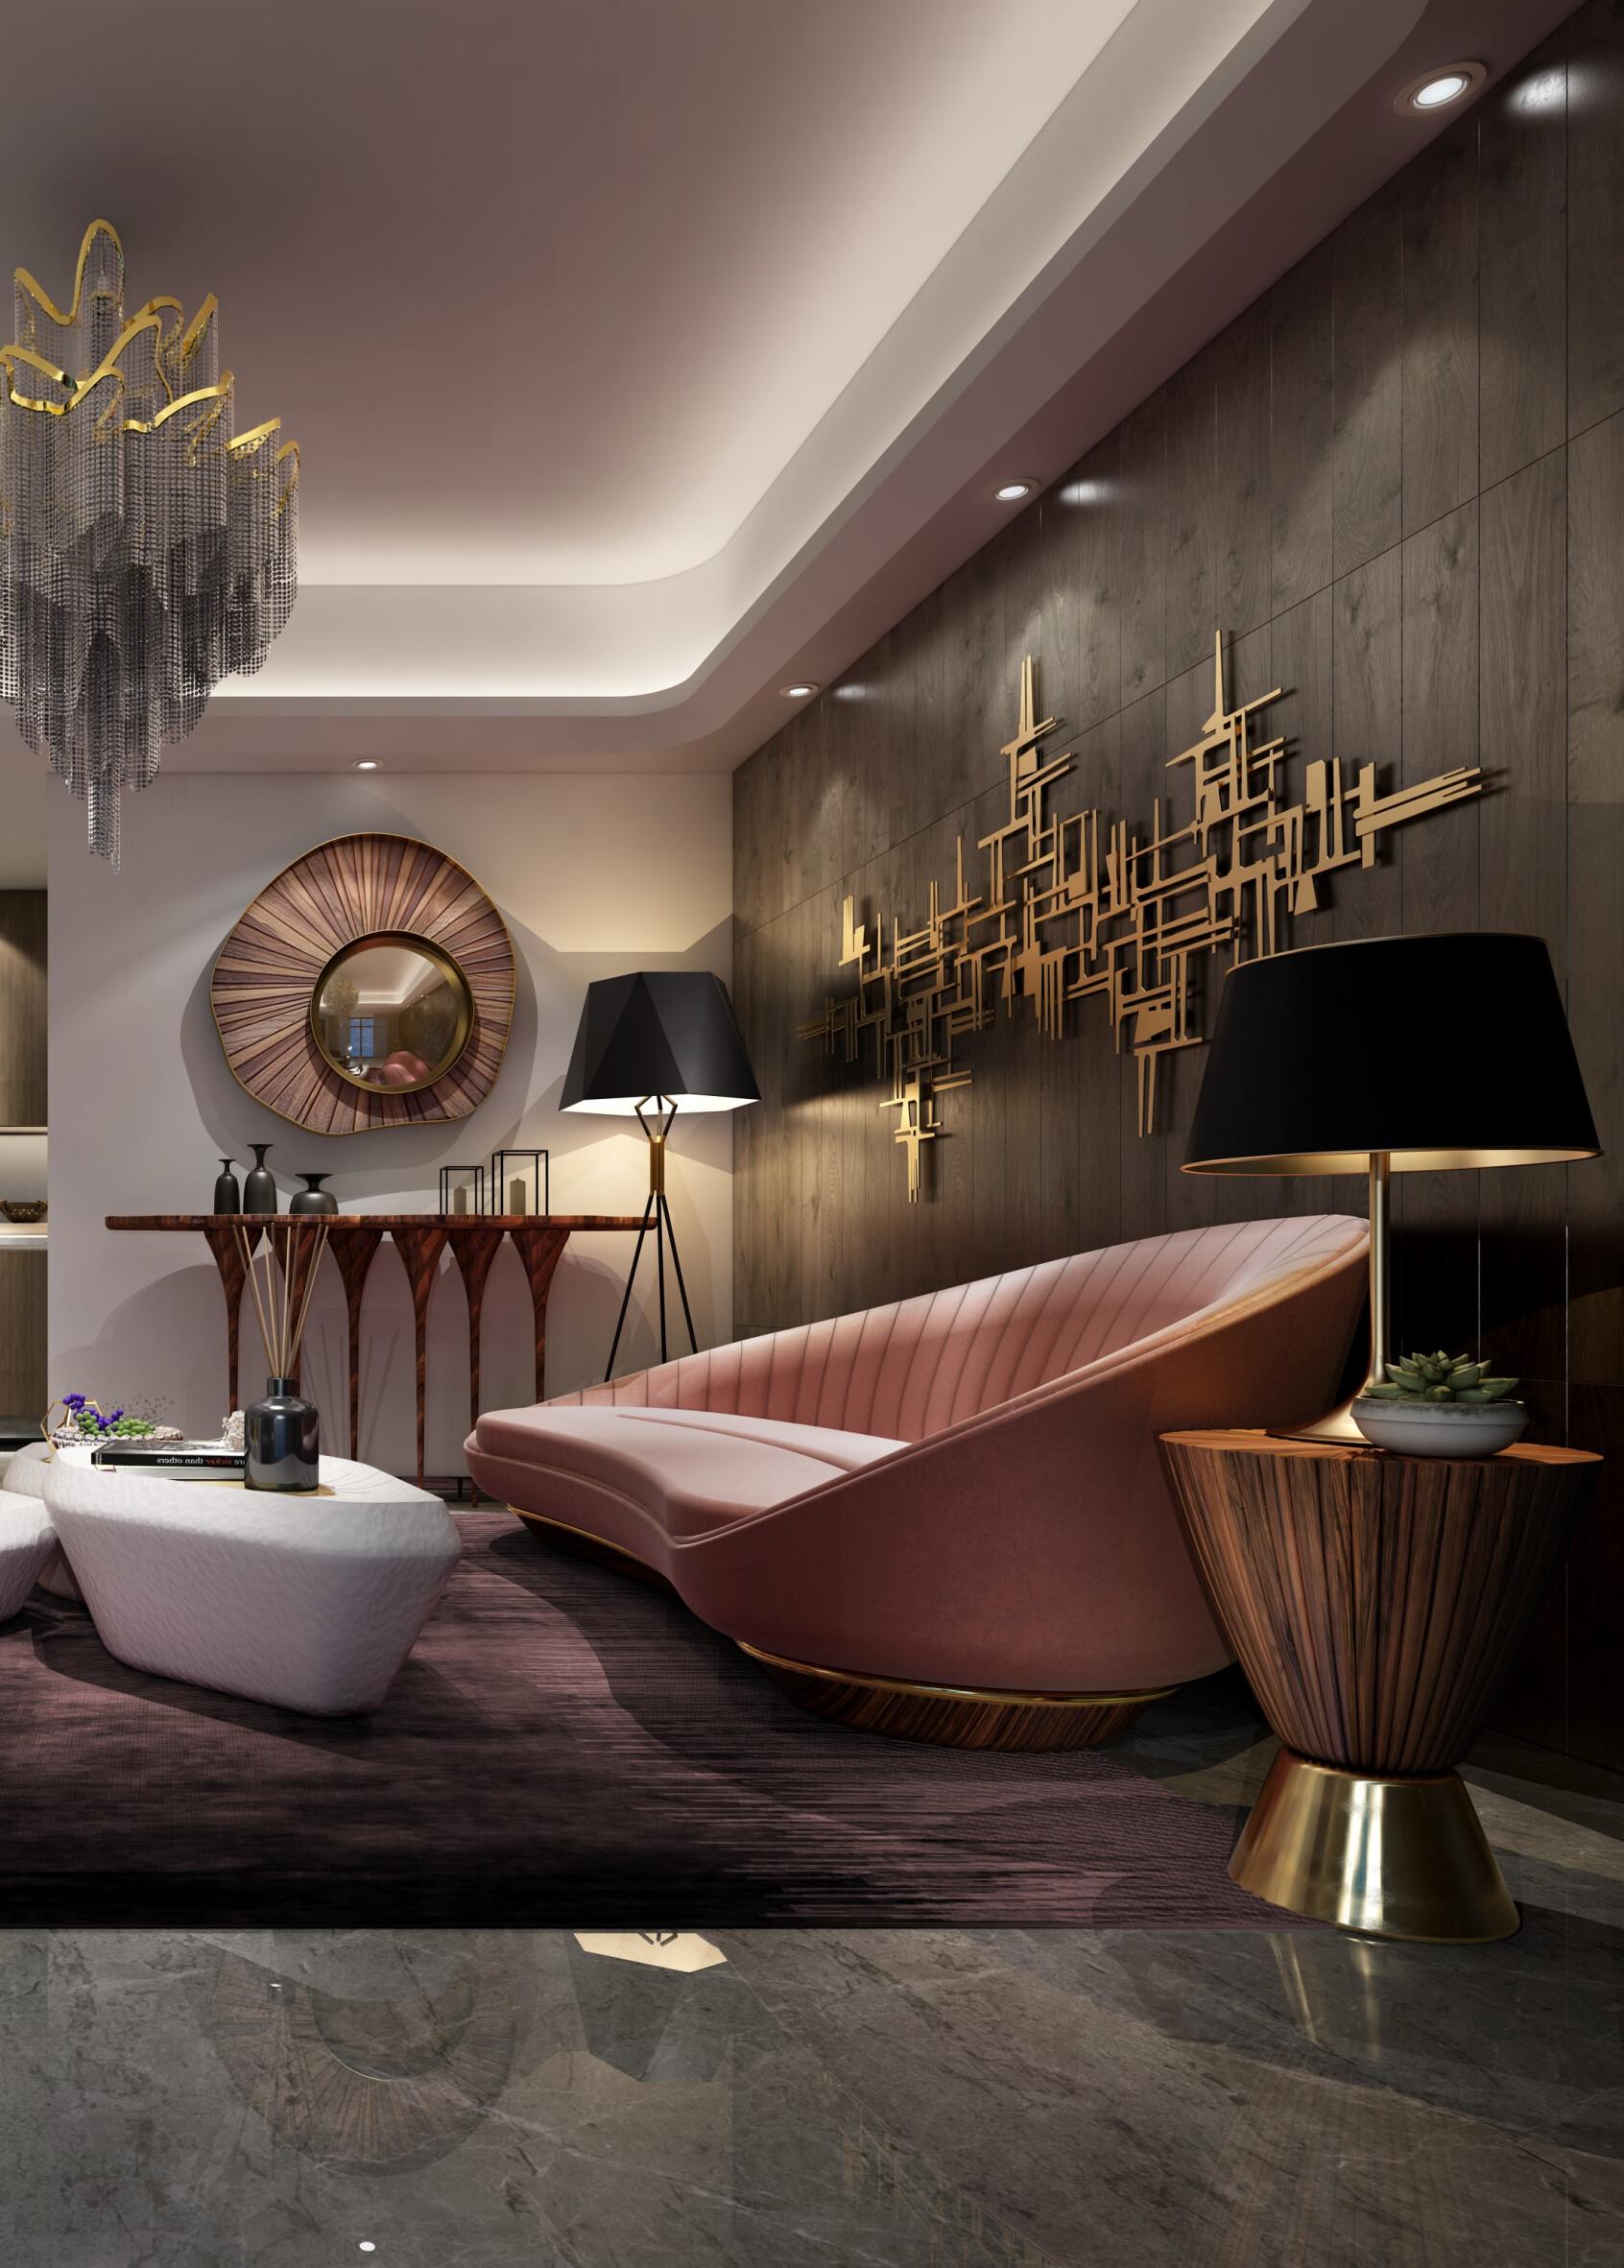 005 - Luxury Interior Design - ALMA de LUCE Project in Los Angeles